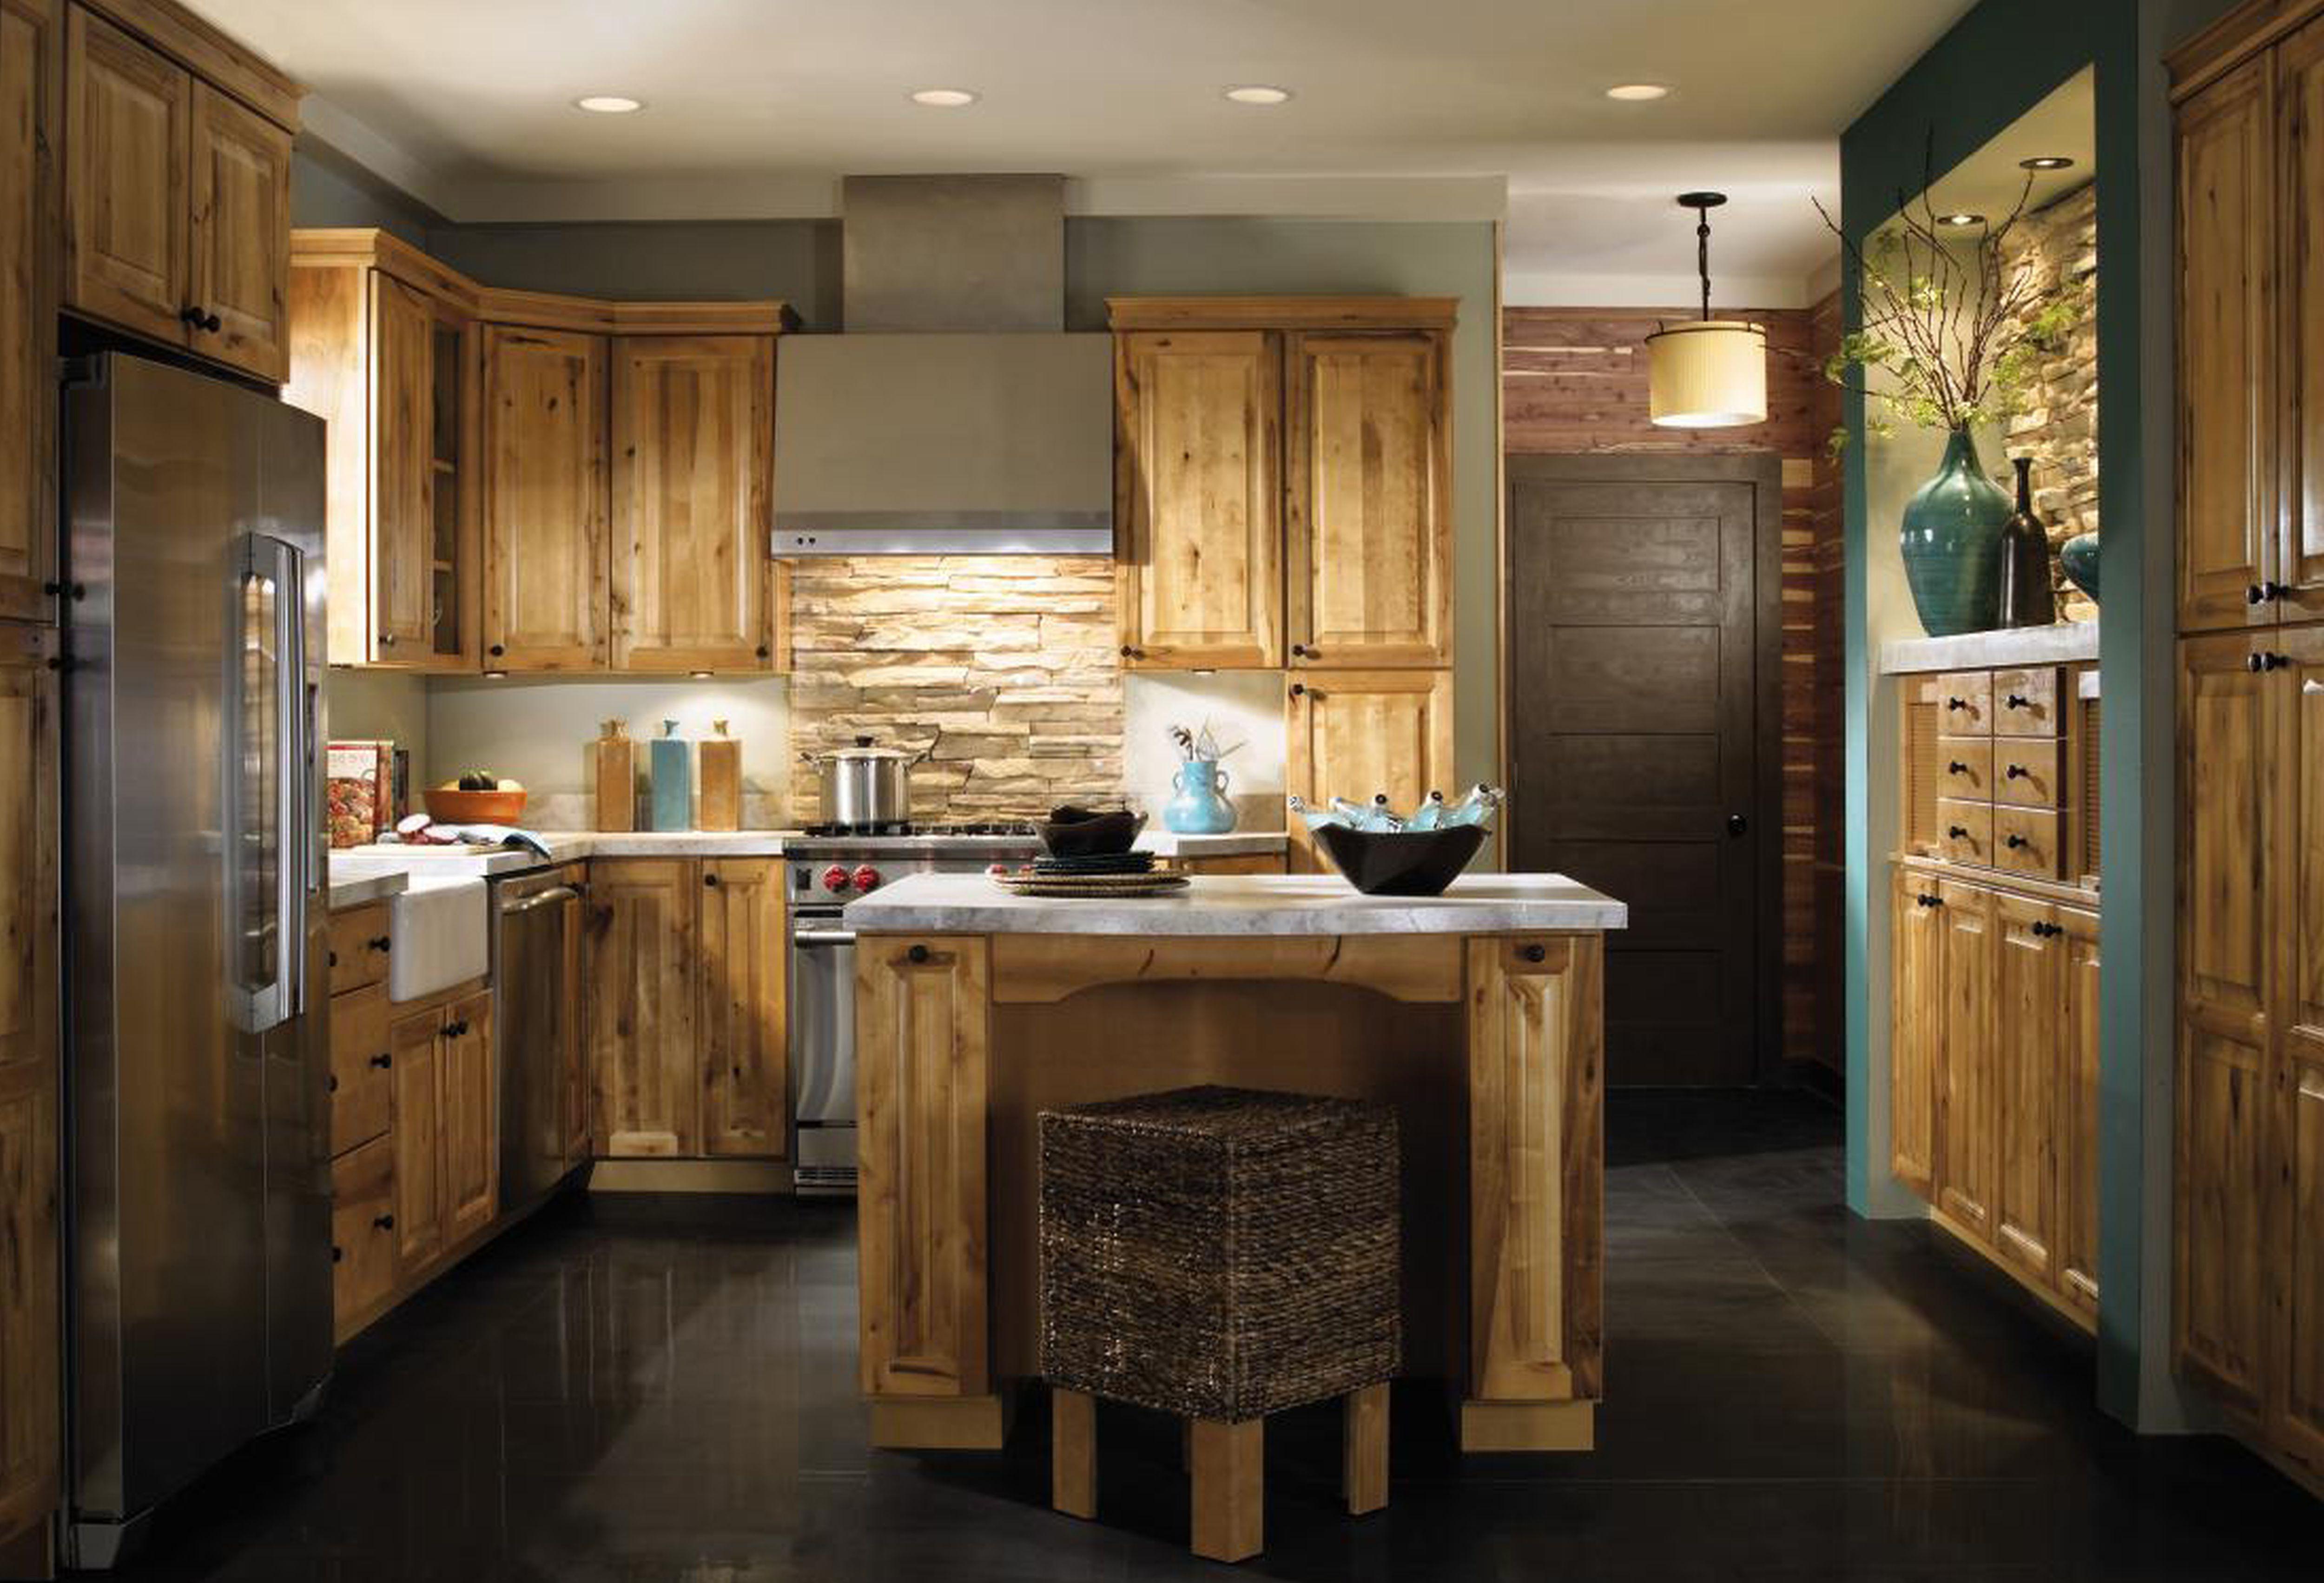 Stone Backsplash Dark Cabinets rustic kitchen cabinets | kitchen, rustic modern kitchen decor